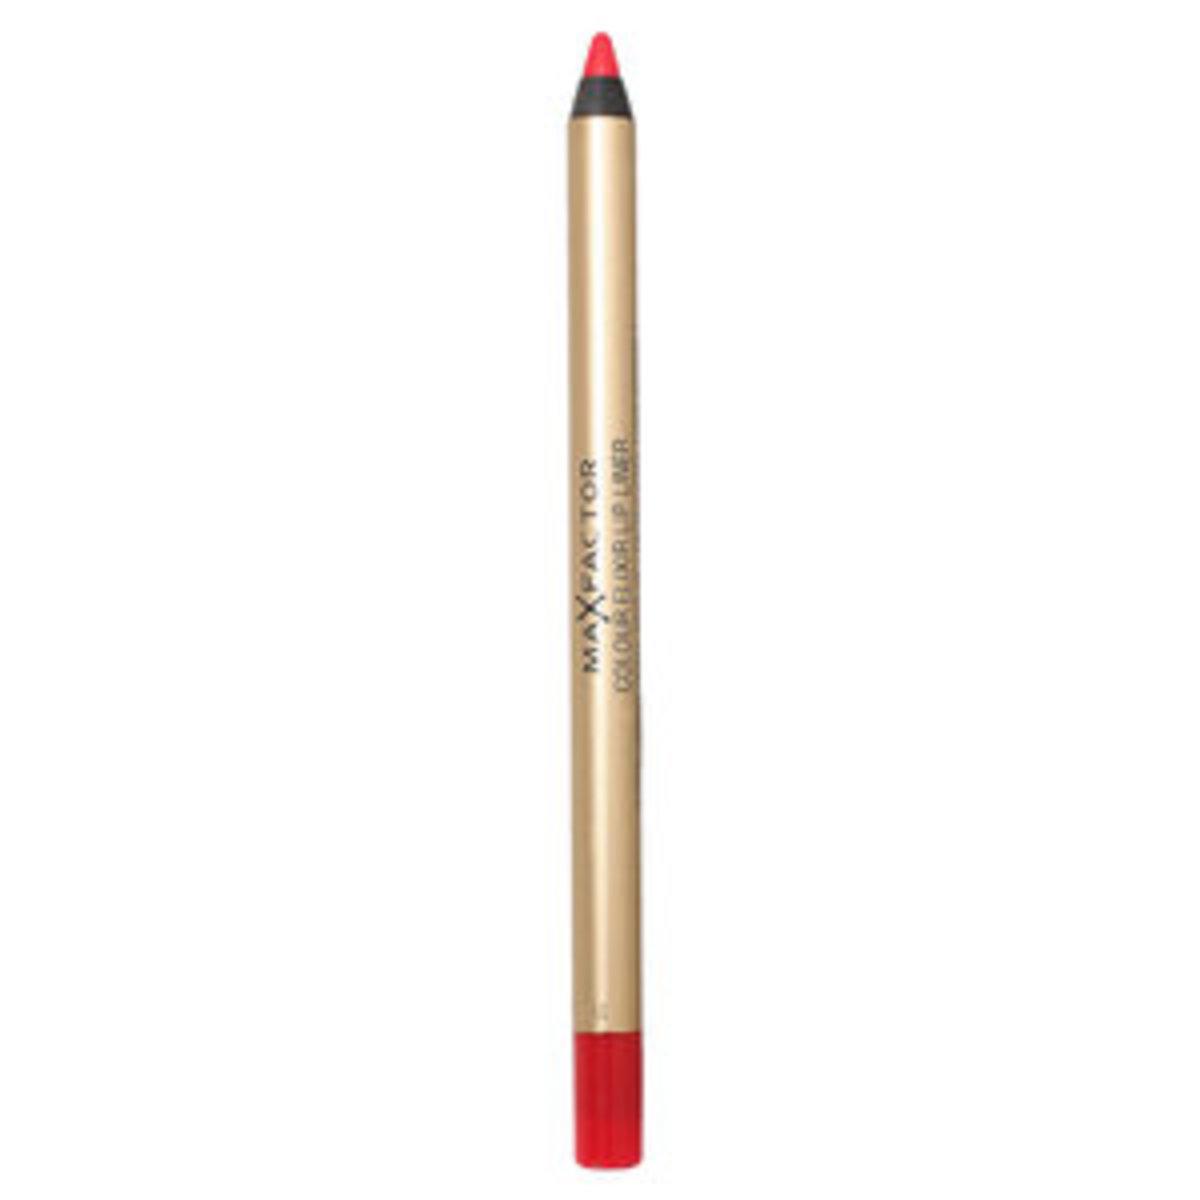 Max Factor Elixir Lip Pencil in Ruby Tuesday